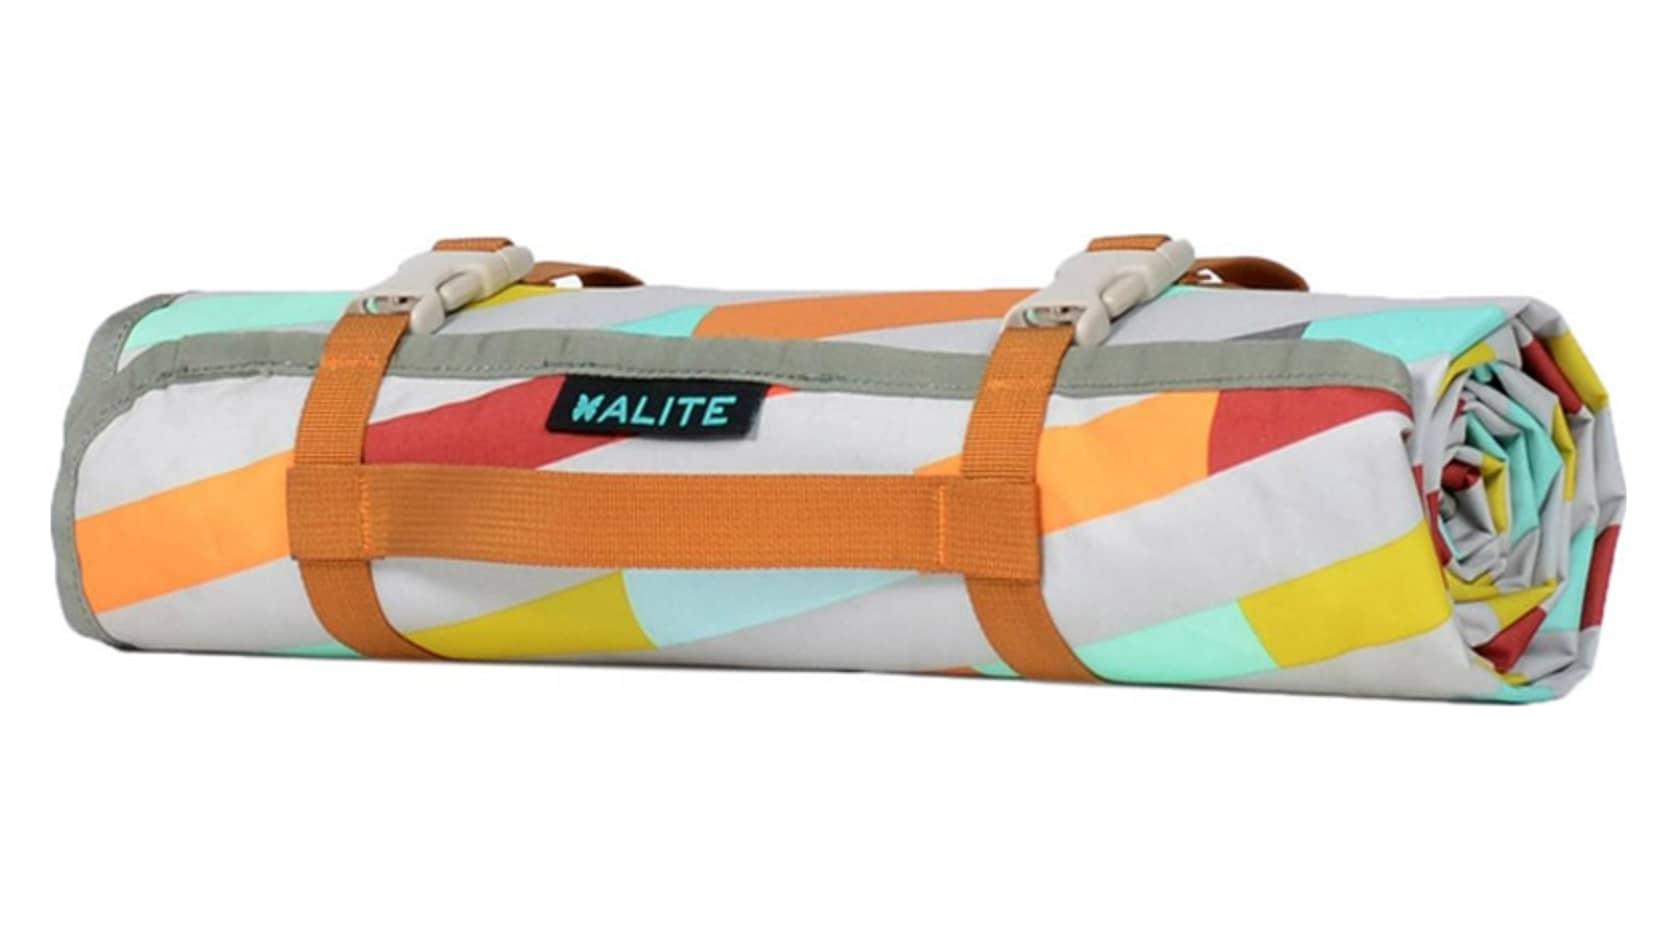 Alite Meadow Mat Picnic Blanket Multi Colored 25l